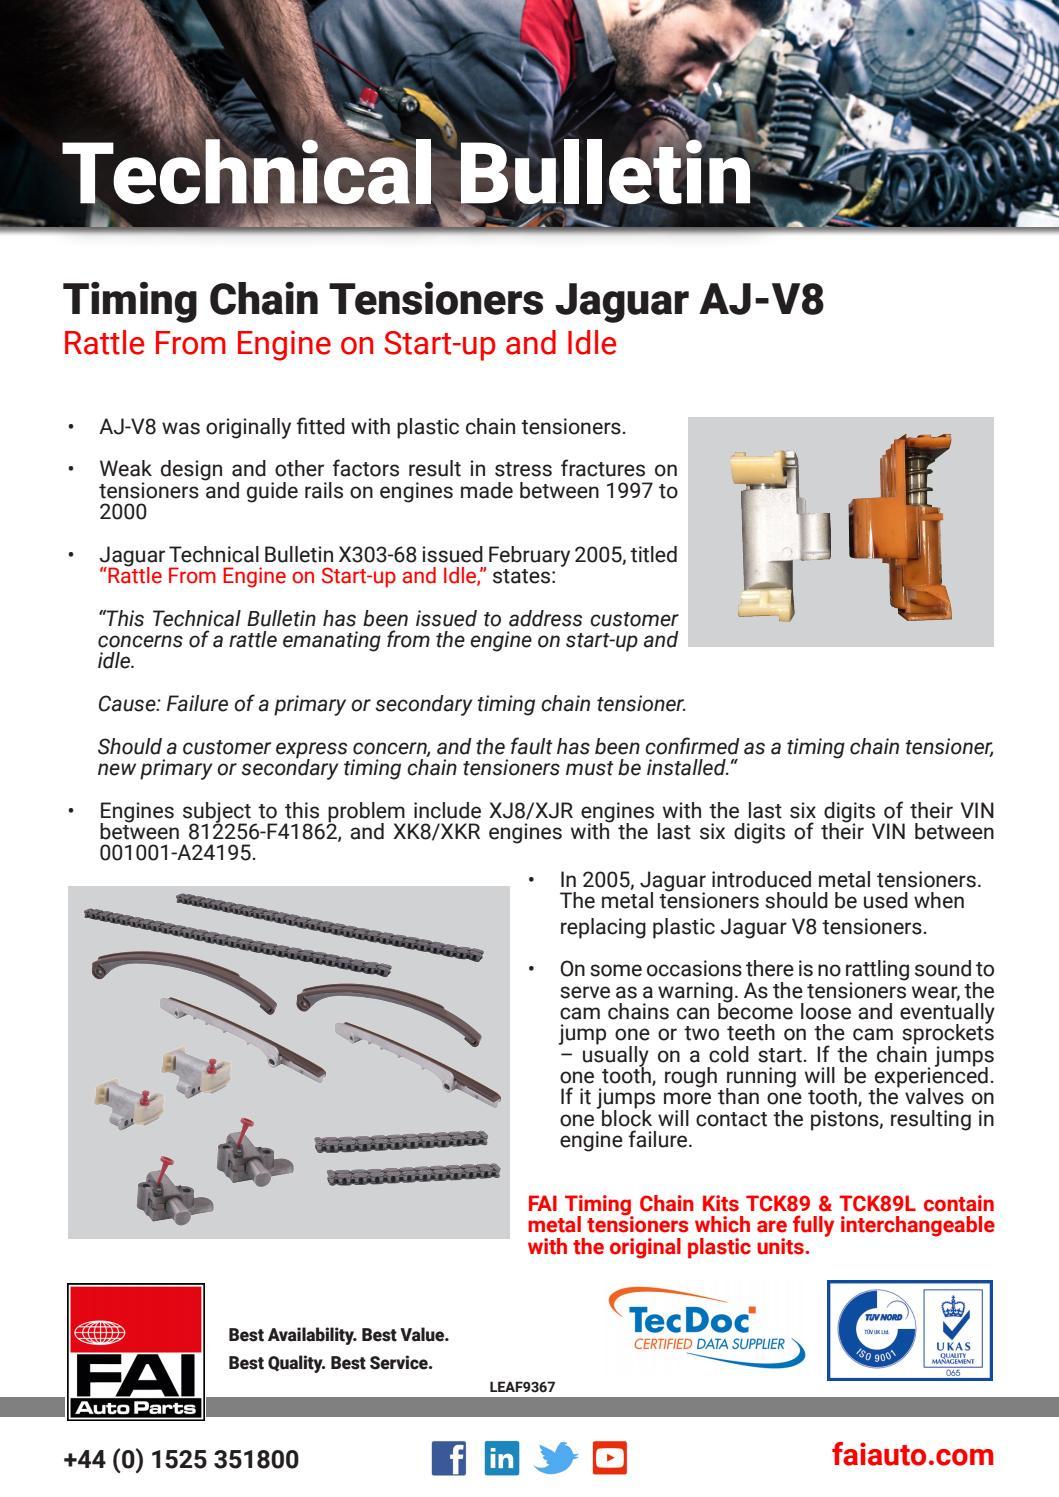 LEAF 9367 Technical Bulletin TCK89 Tensioner by FAI